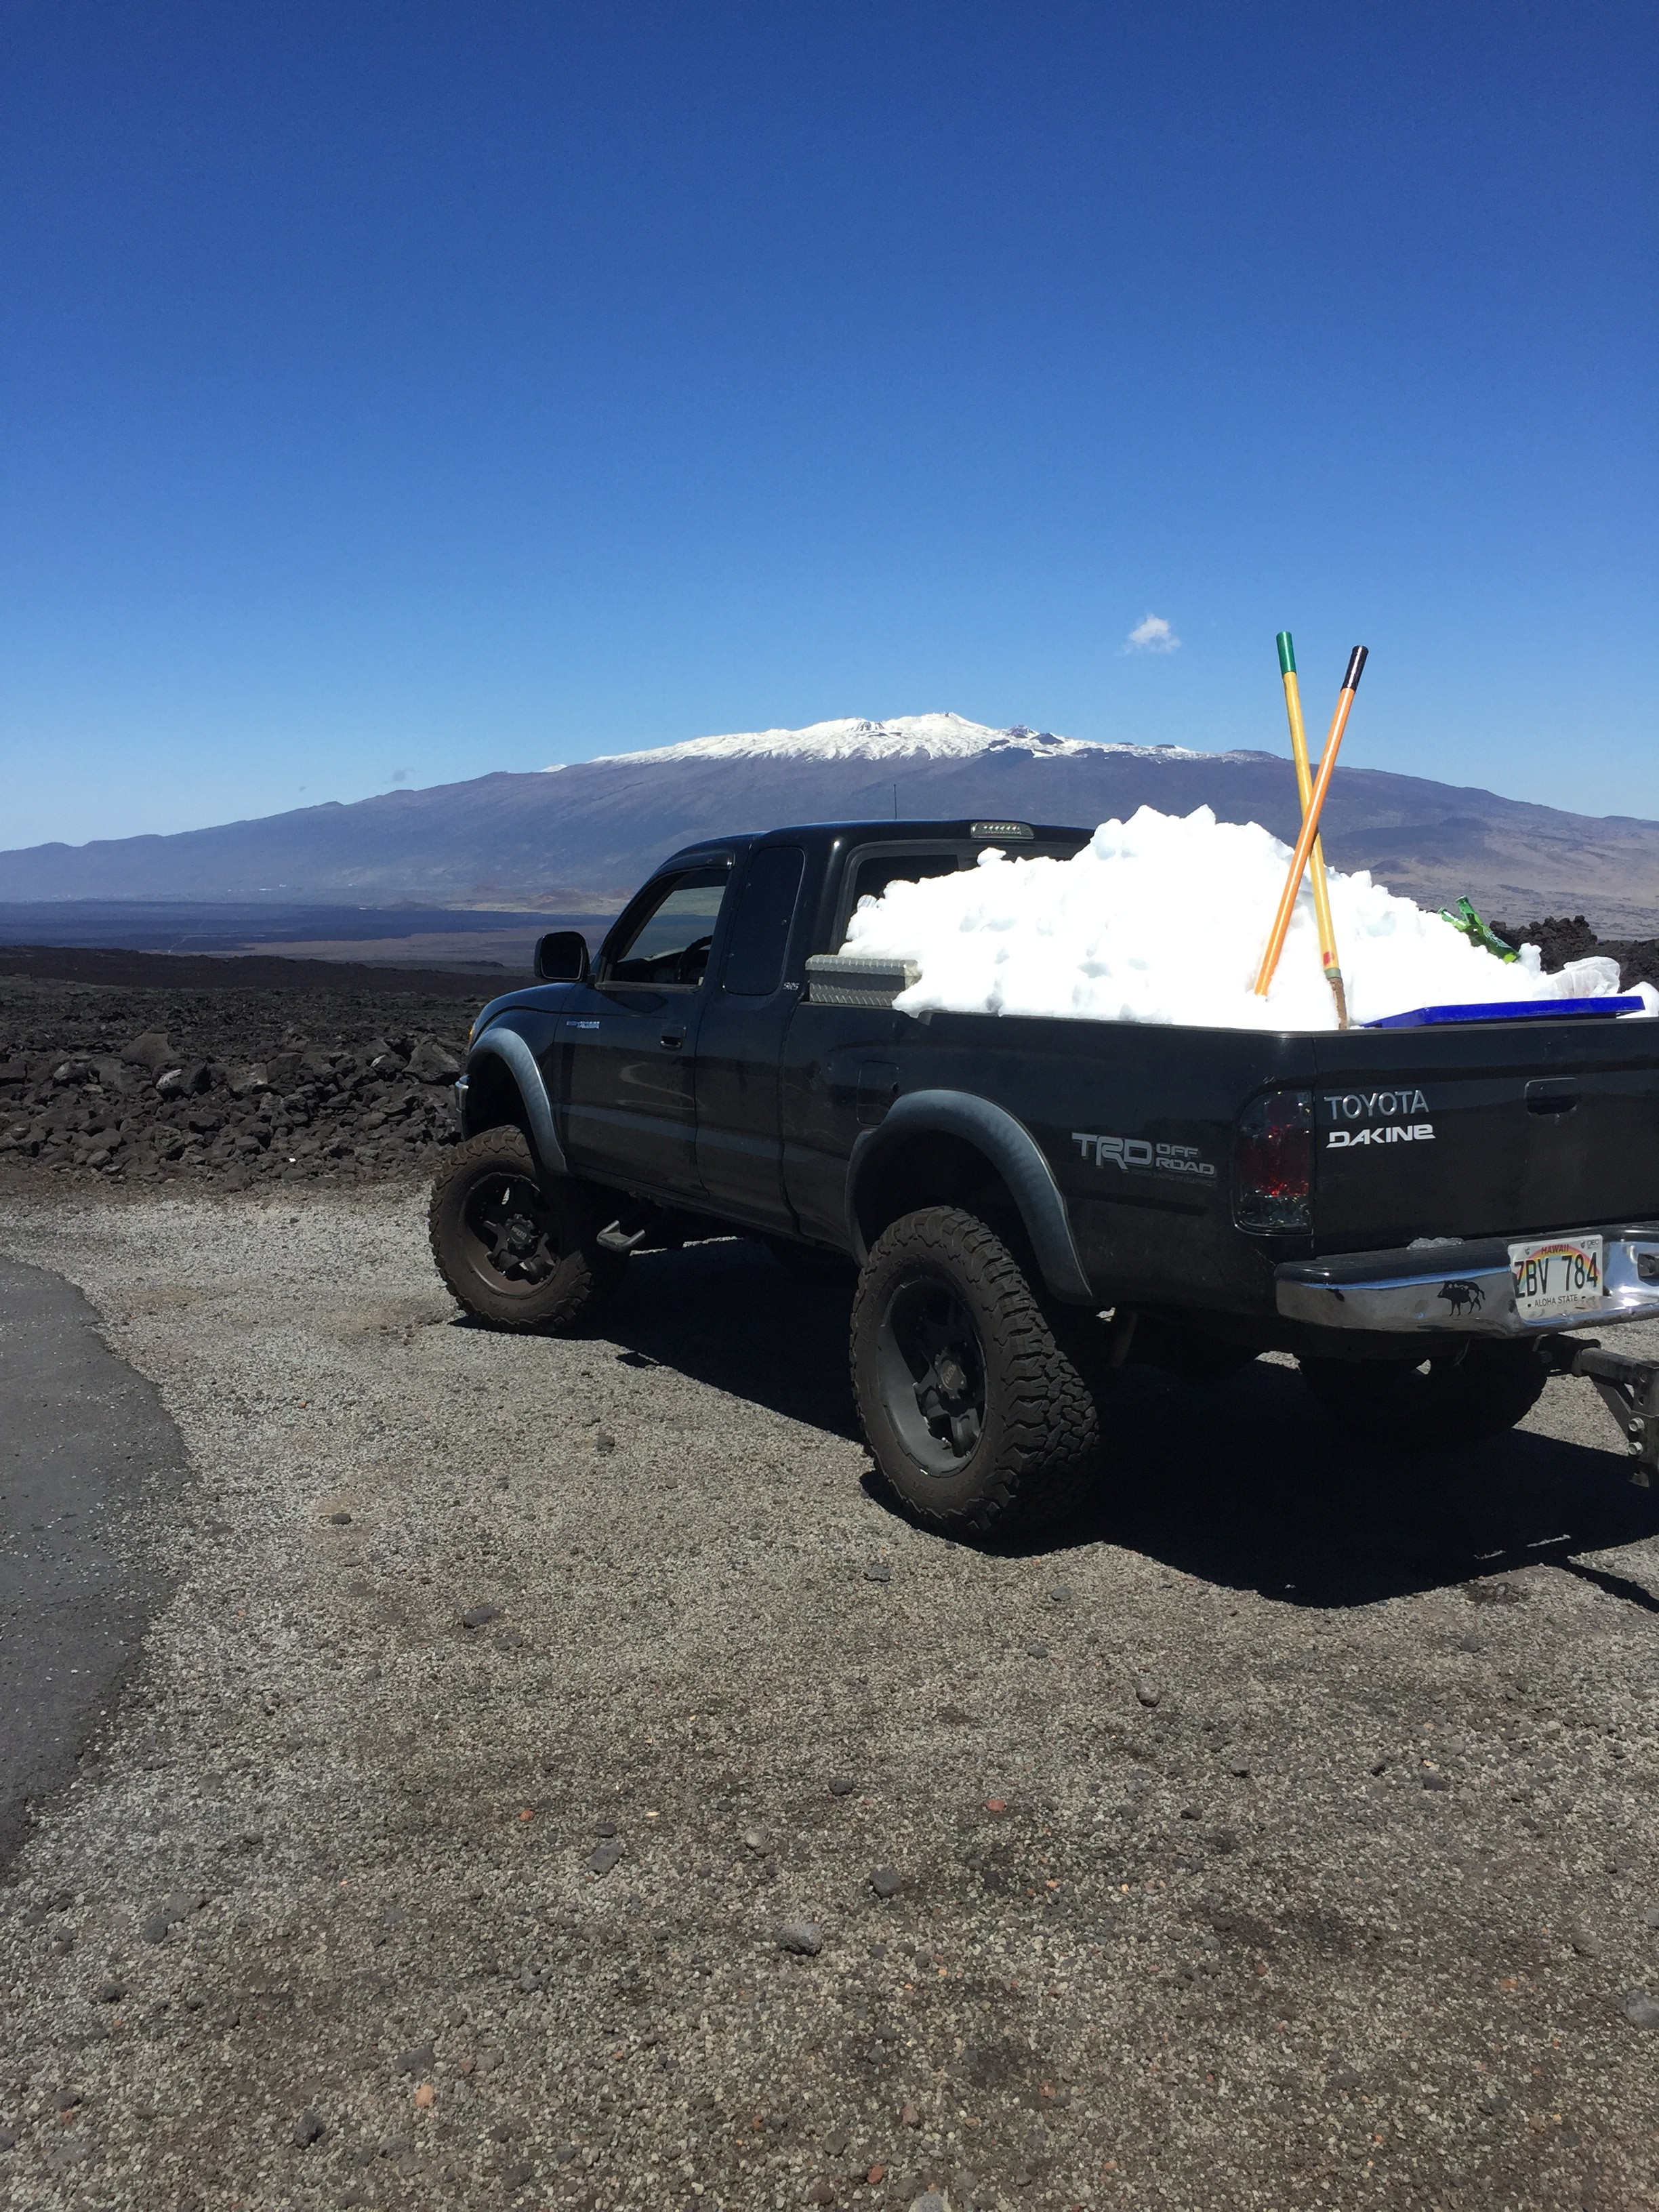 Mauna Loa snow on 3.15.15 / Image: Rochelle Hunt